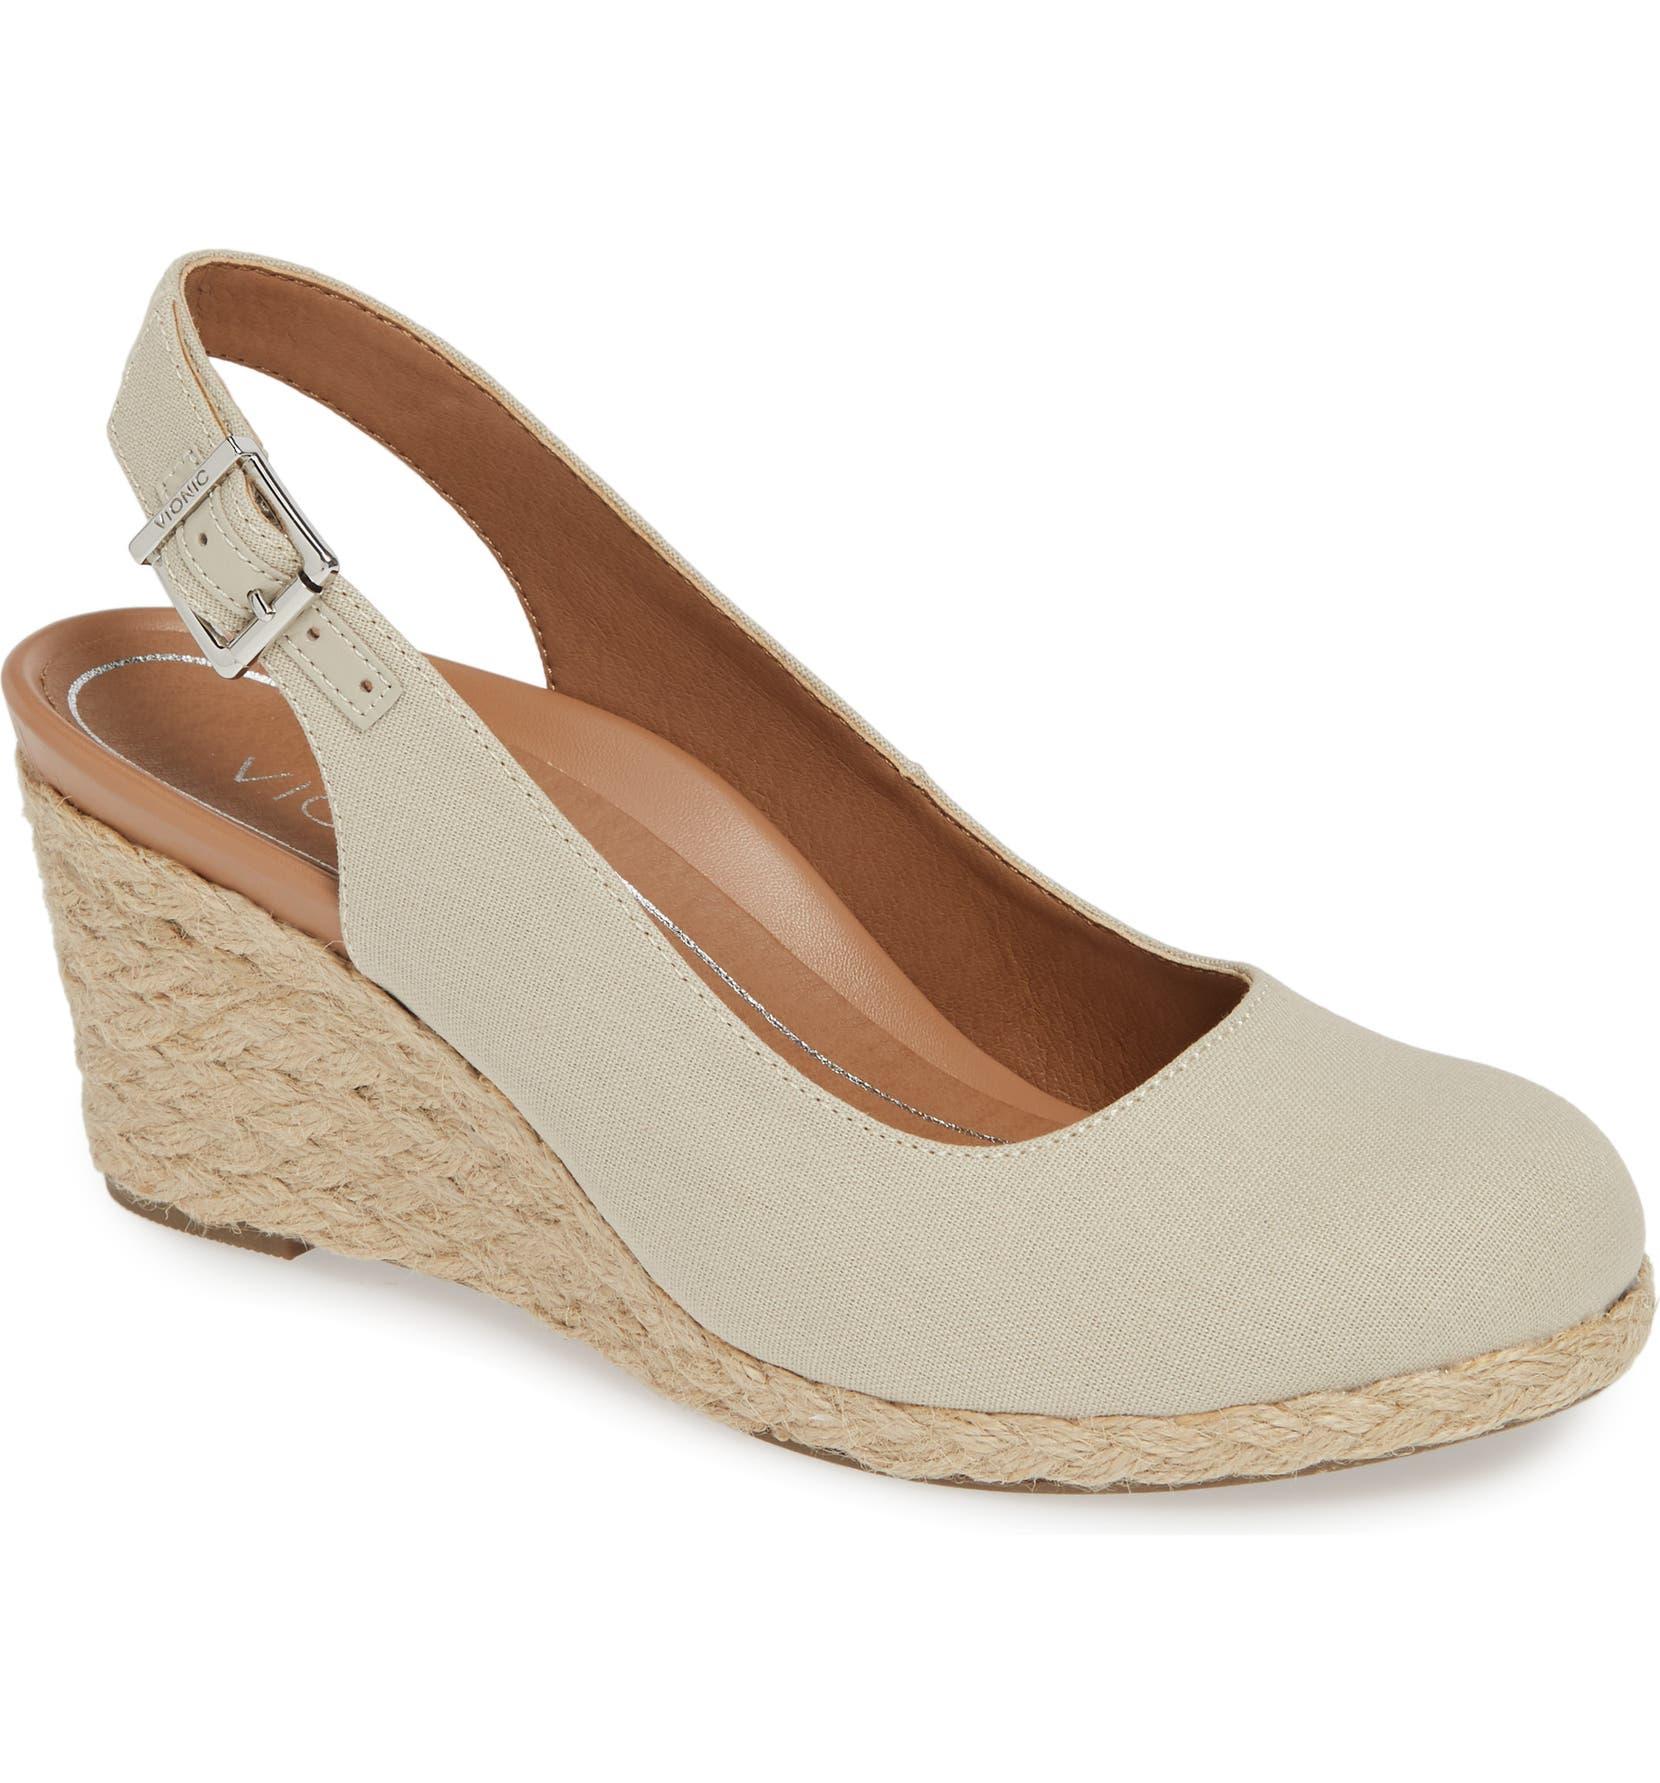 143b899a234 Coralina Orthaheel® Espadrille Wedge Slingback Sandal